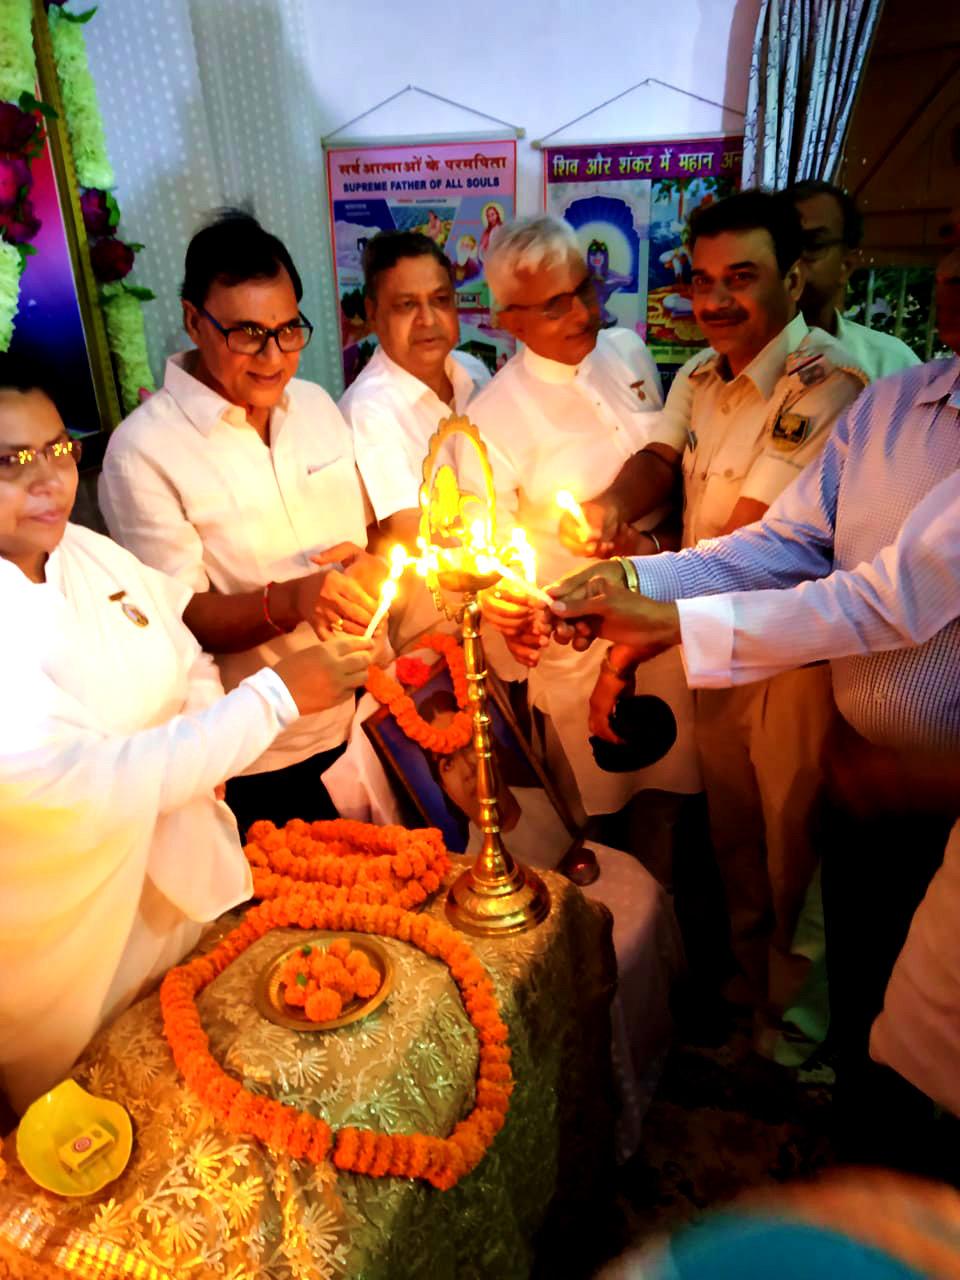 Dr.Madhepuri along with Rajyogini Ranju Didi, Civil Surgeon Dr.Gadadhar Pandey and others inaugurating a function at Prajapita Brahma Kumari Ishwariya Vishwavidyalaya Madhepura.